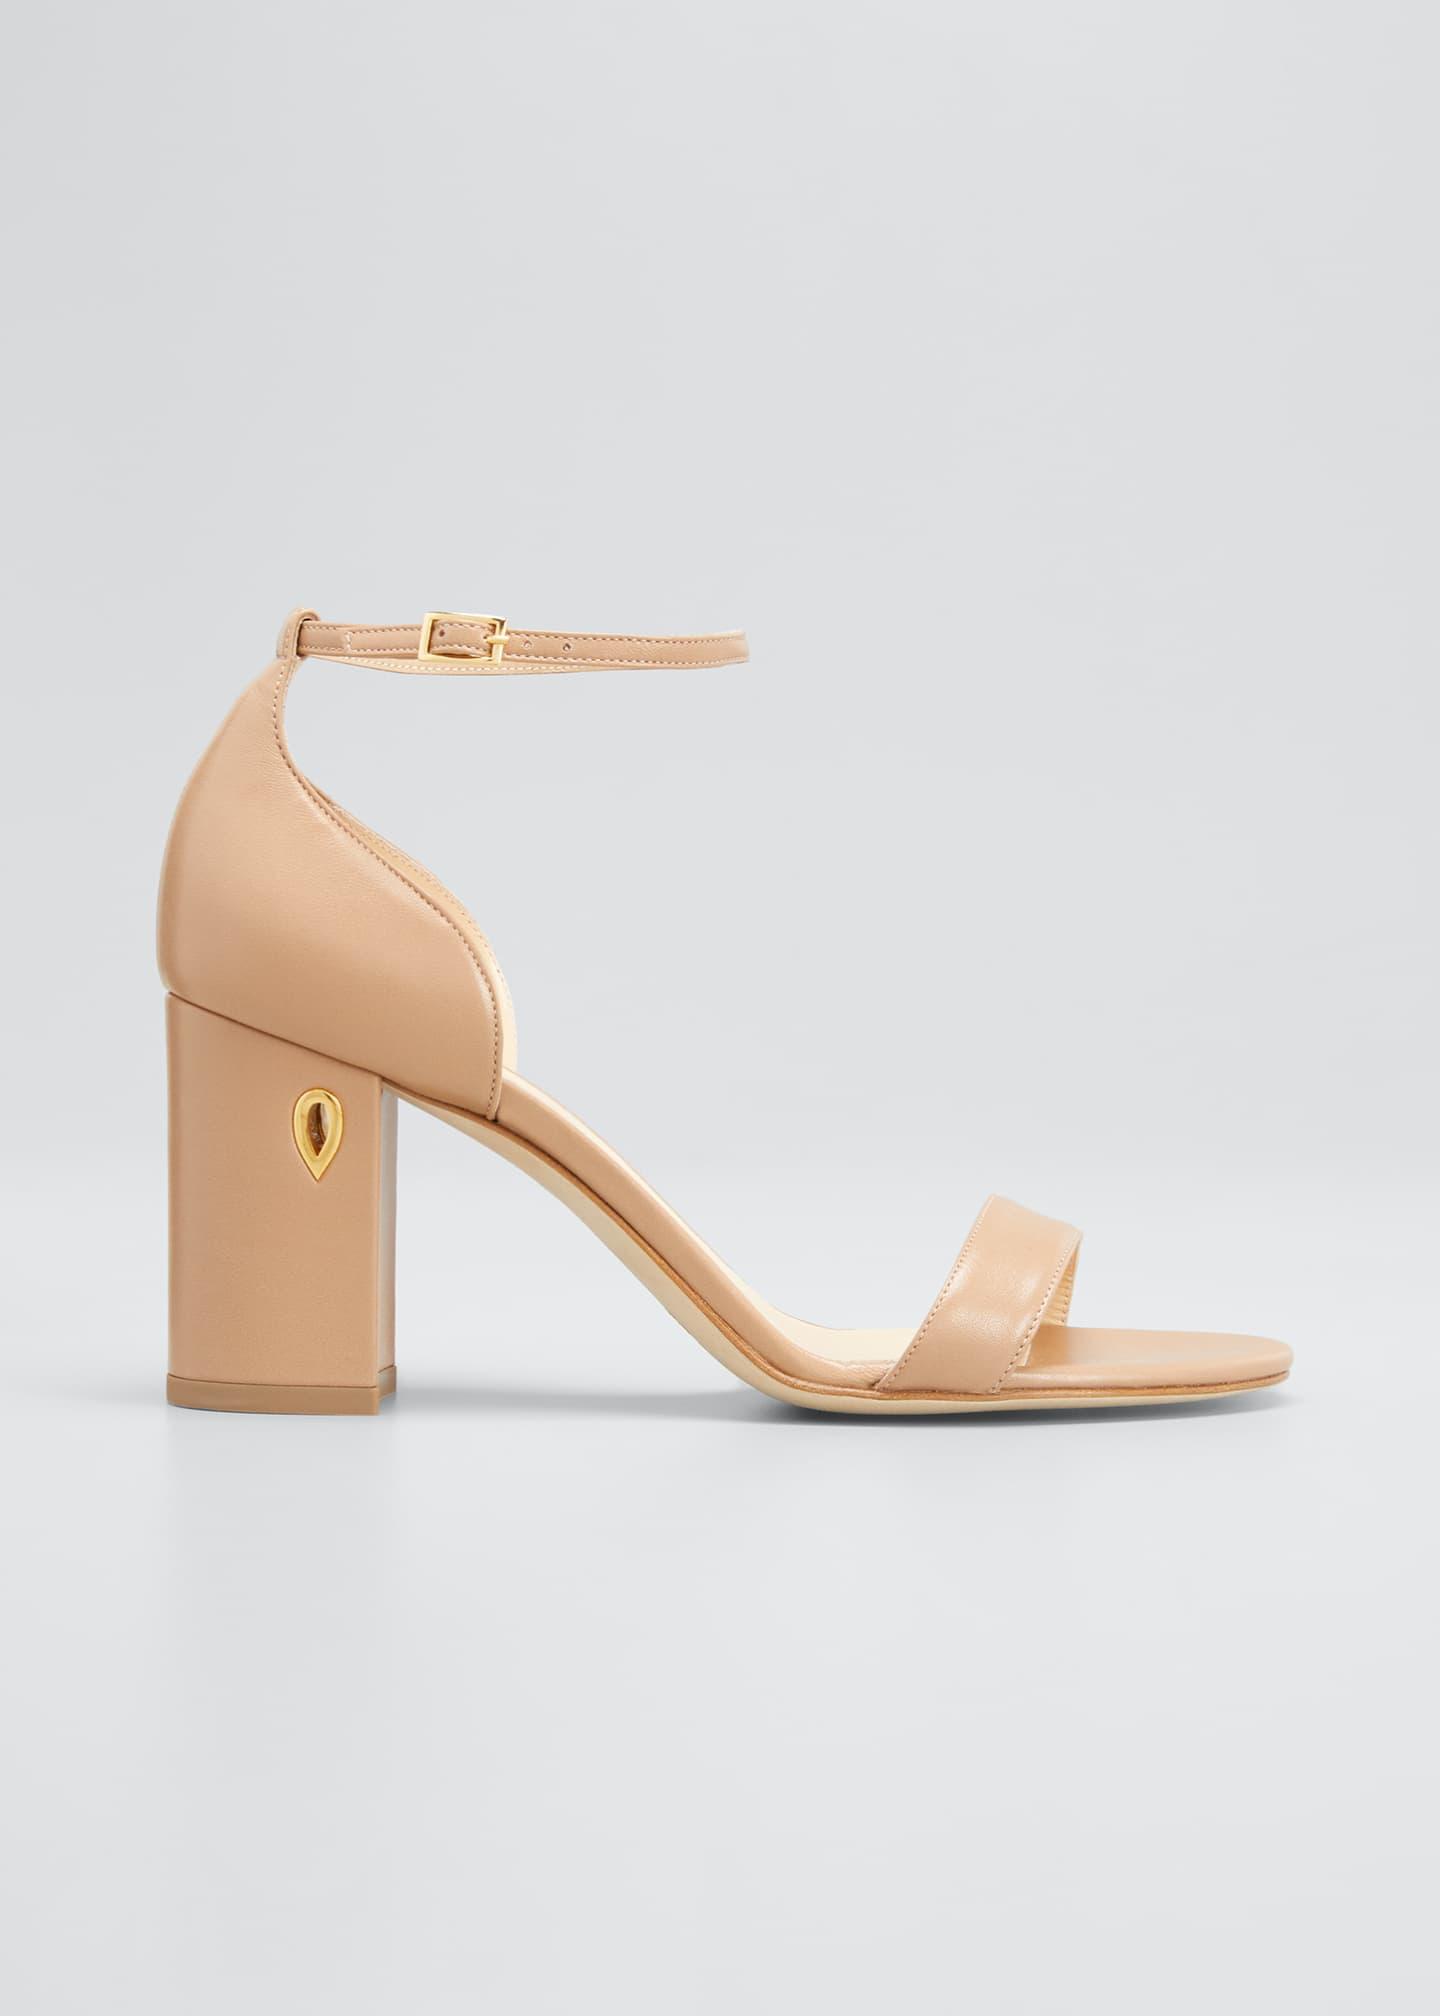 Jennifer Chamandi 85mm Napa Block-Heel Sandals